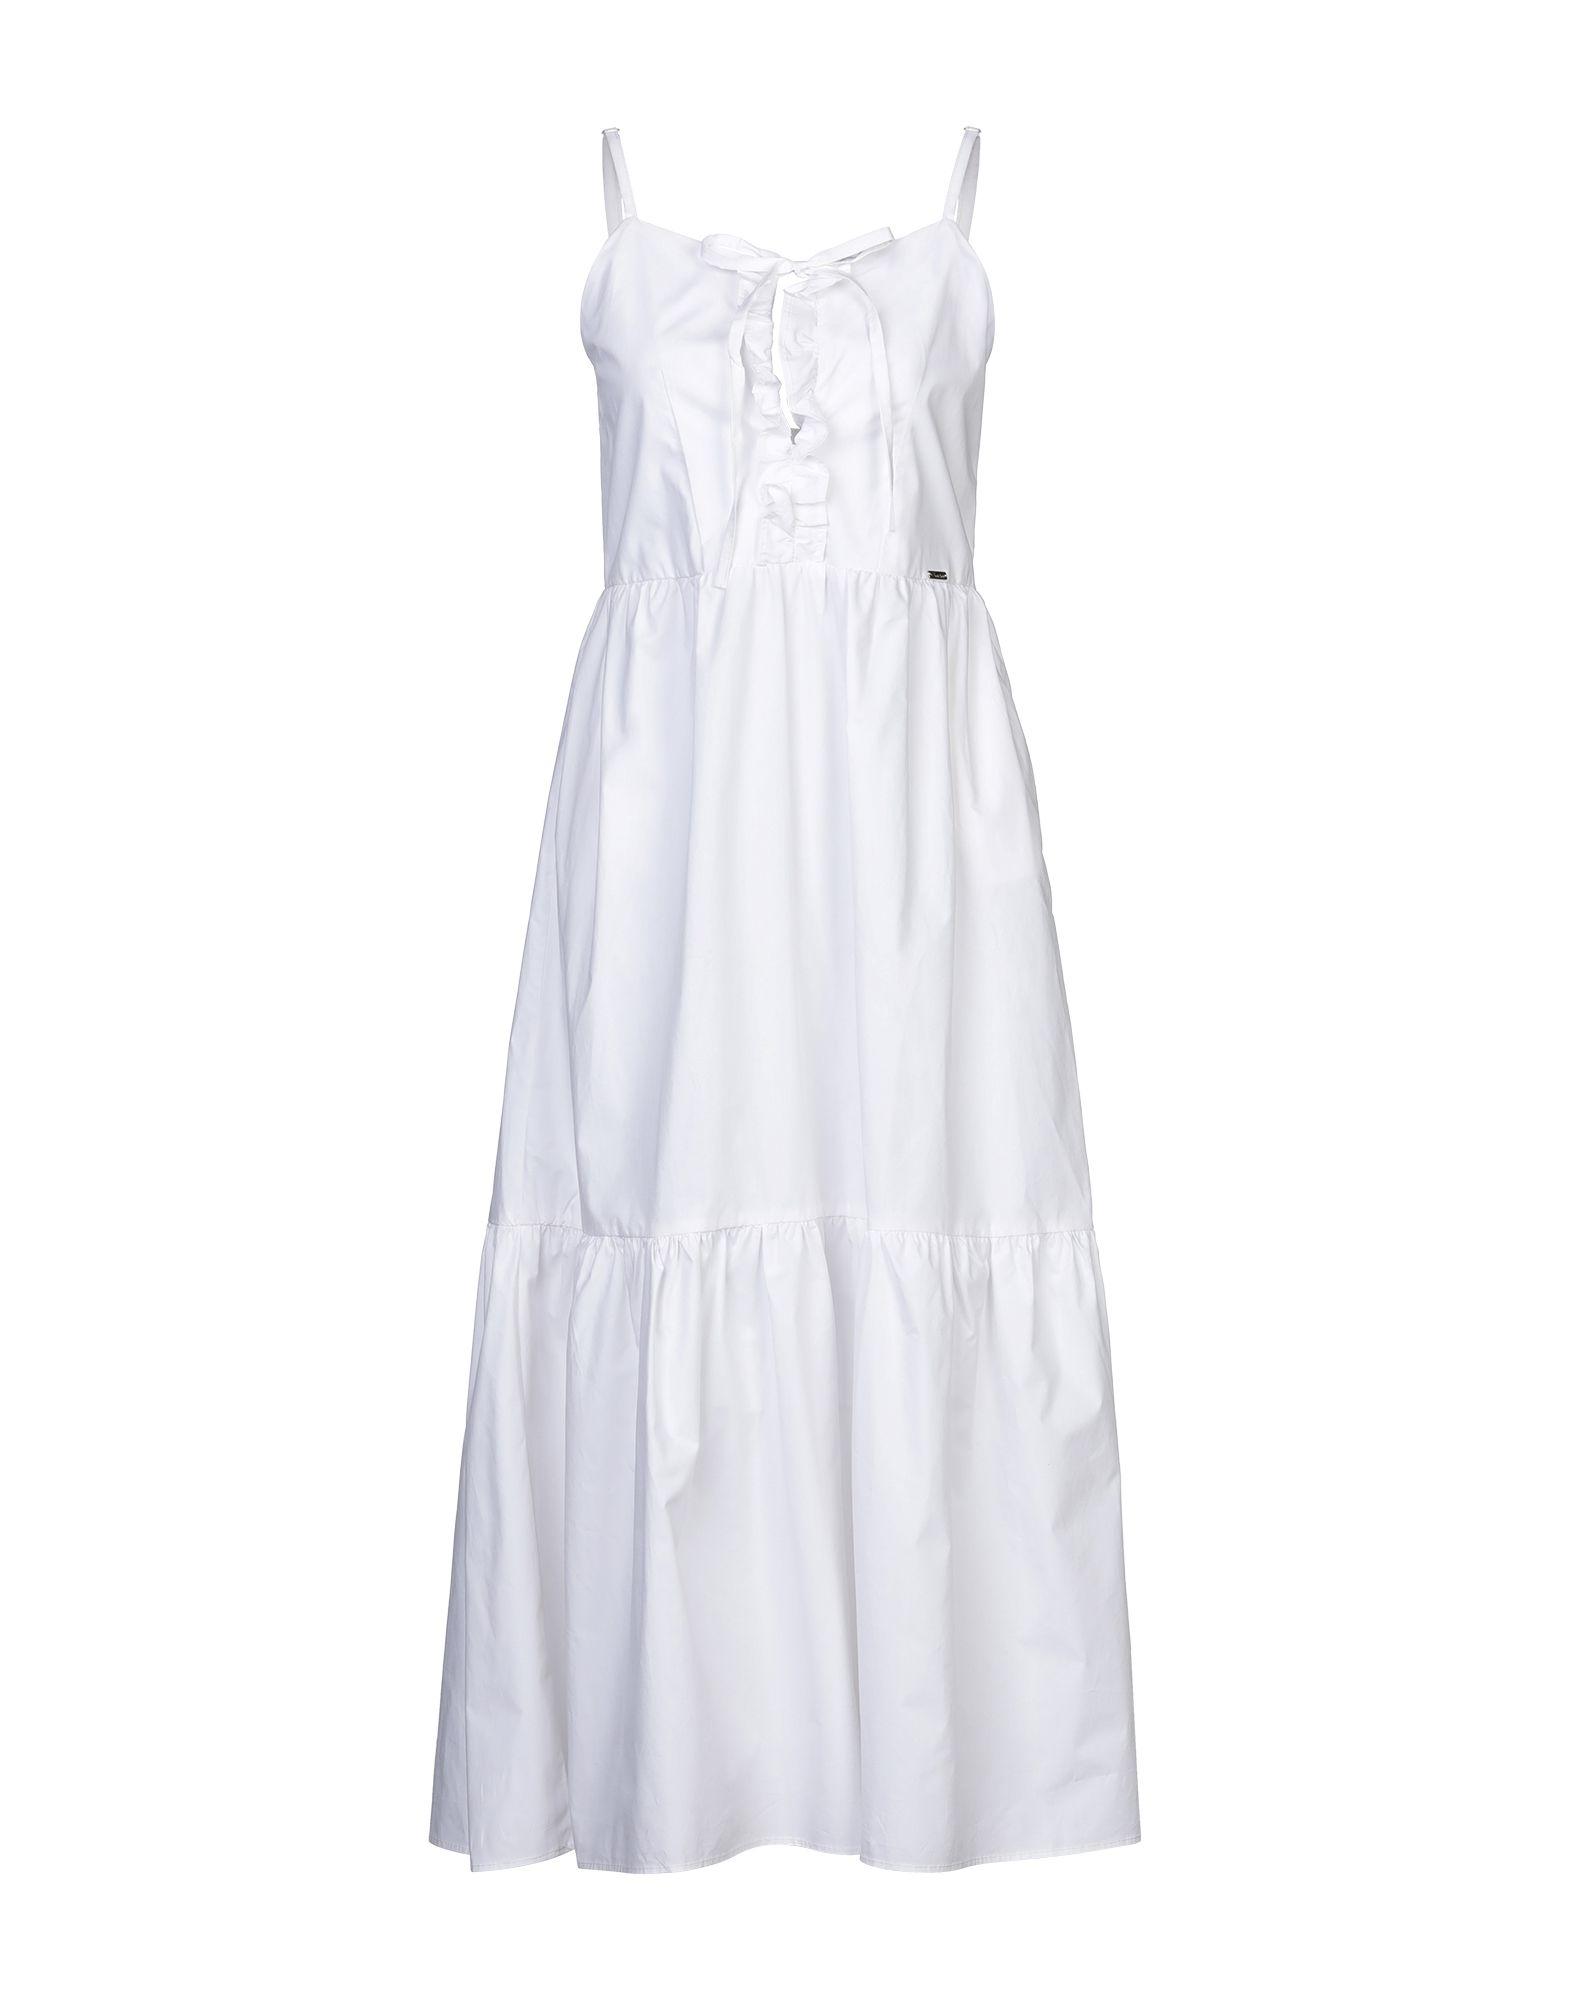 SARAH CHOLE for BAD GIRL Длинное платье